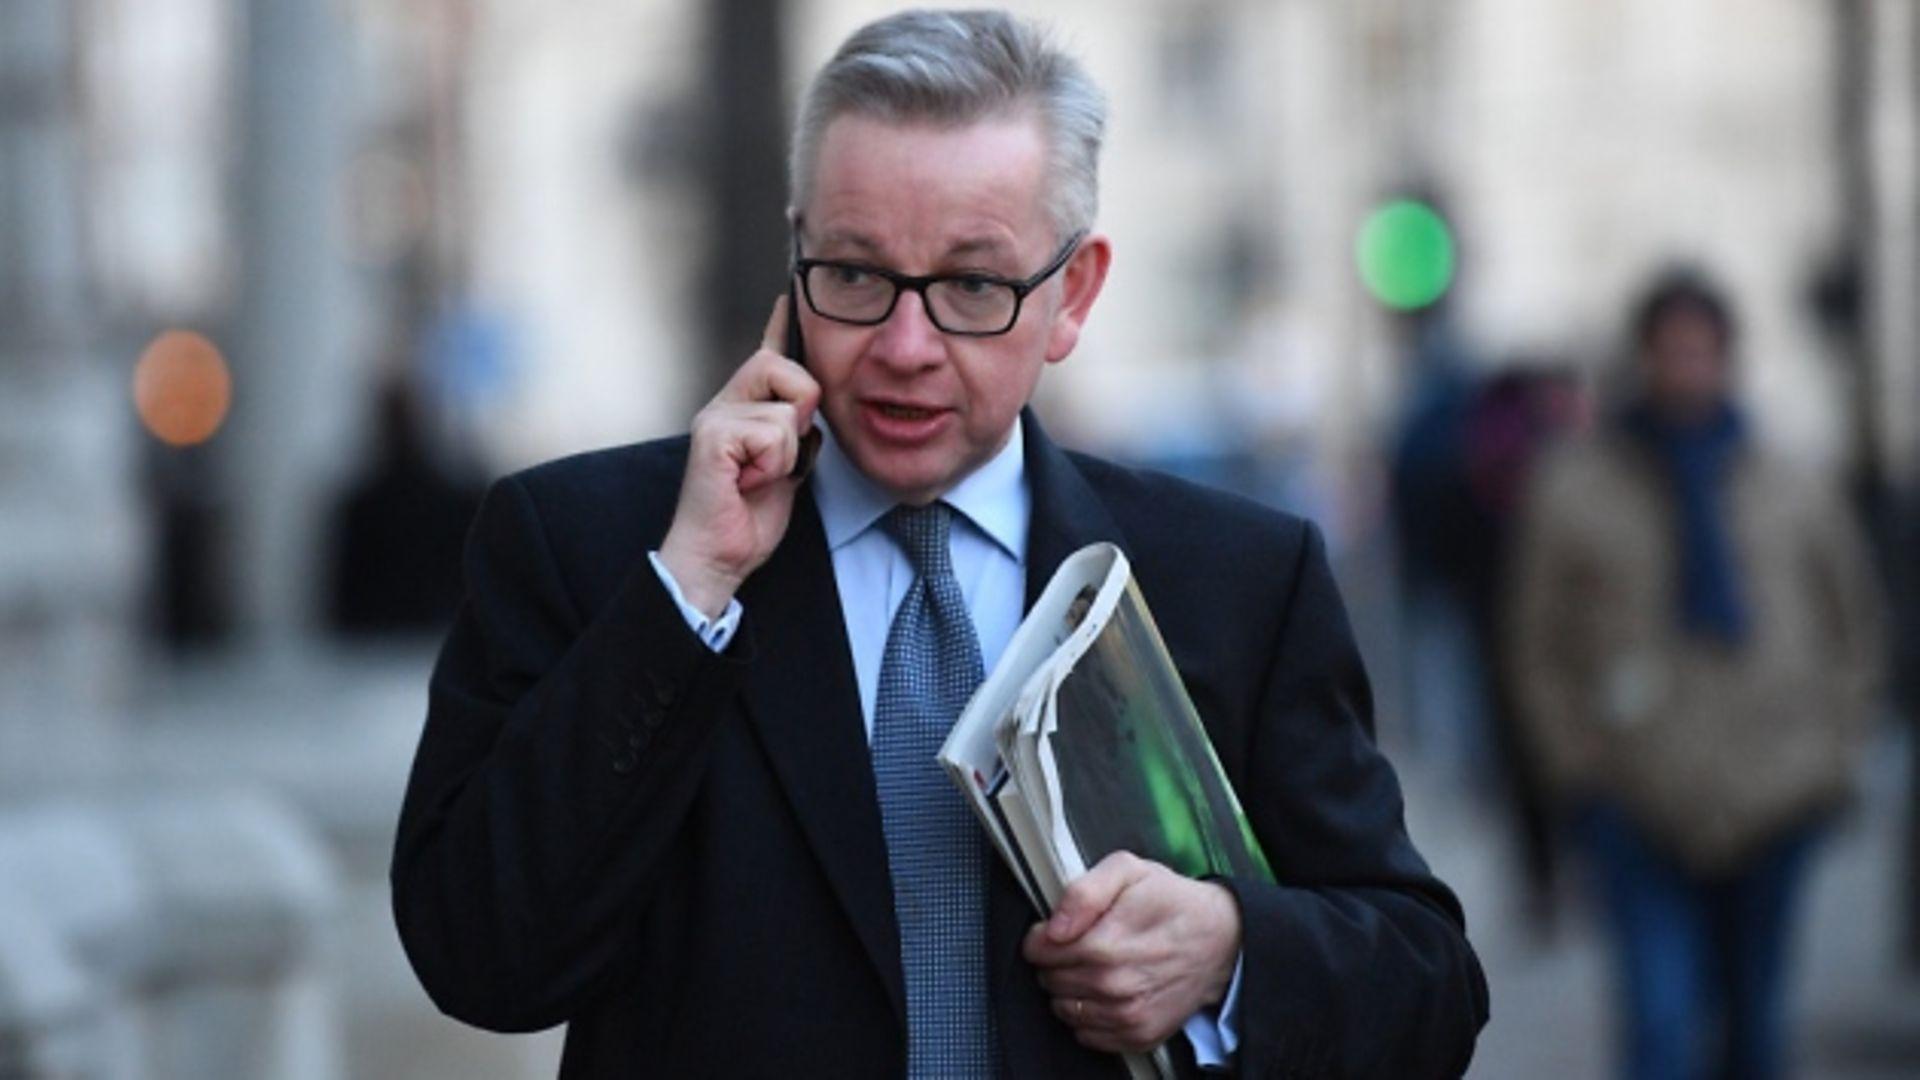 Cabinet minister Michael Gove in Whitehall. Photograph: Victoria Jones/PA.